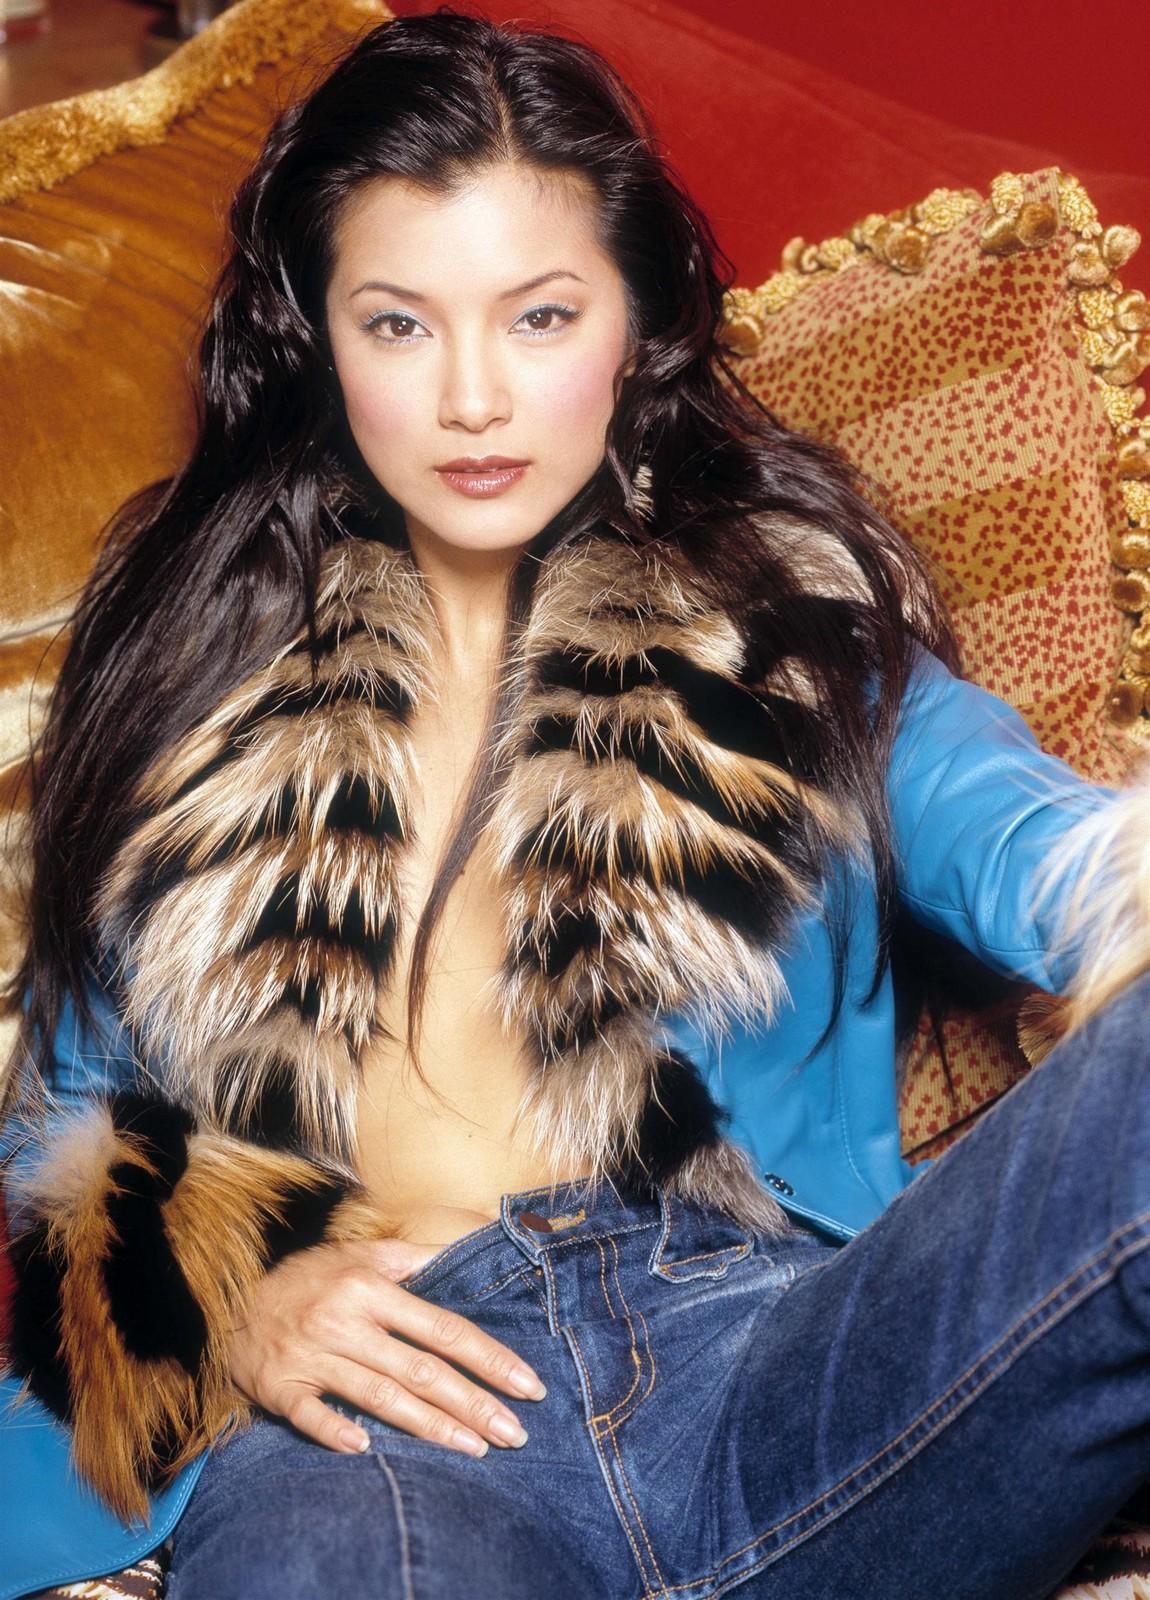 Filmovzia Kelly Hu